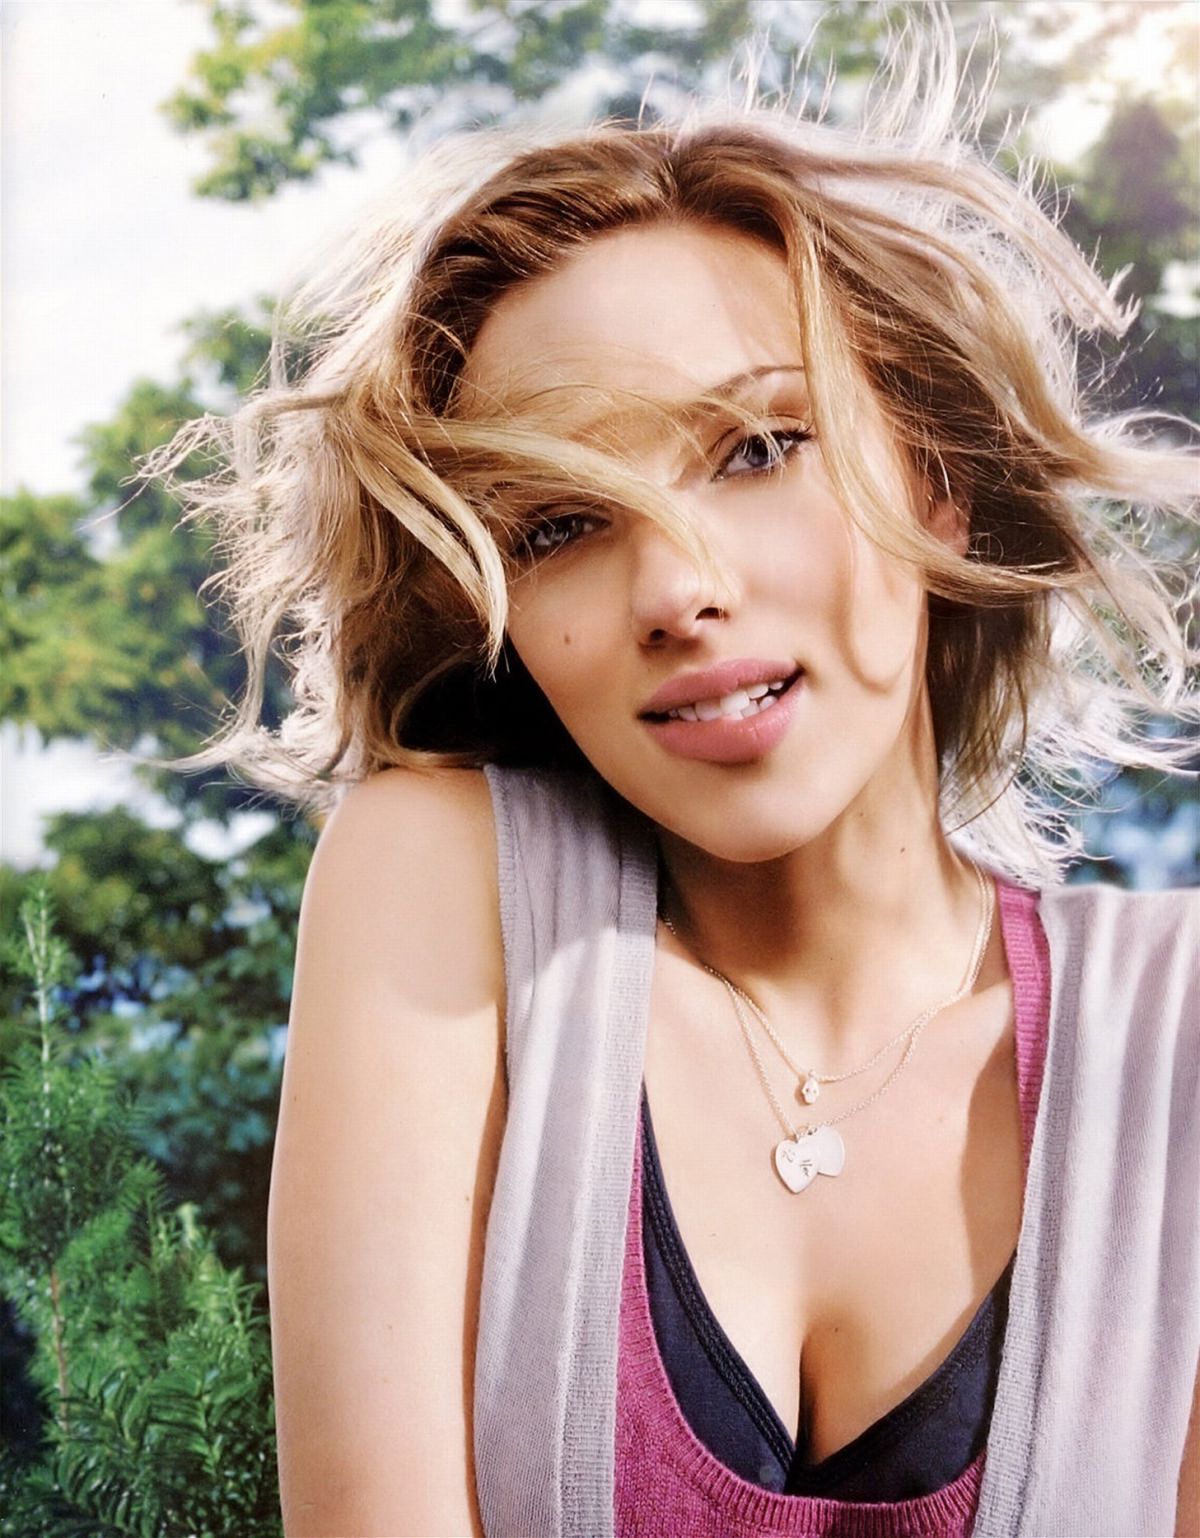 http://2.bp.blogspot.com/-BWqaWariWMA/TmSrI-6E51I/AAAAAAAAAB8/DLVqg7y94c0/s1600/Scarlett-Johansson-Hot-Pics-Corner-+%25285%2529.jpg